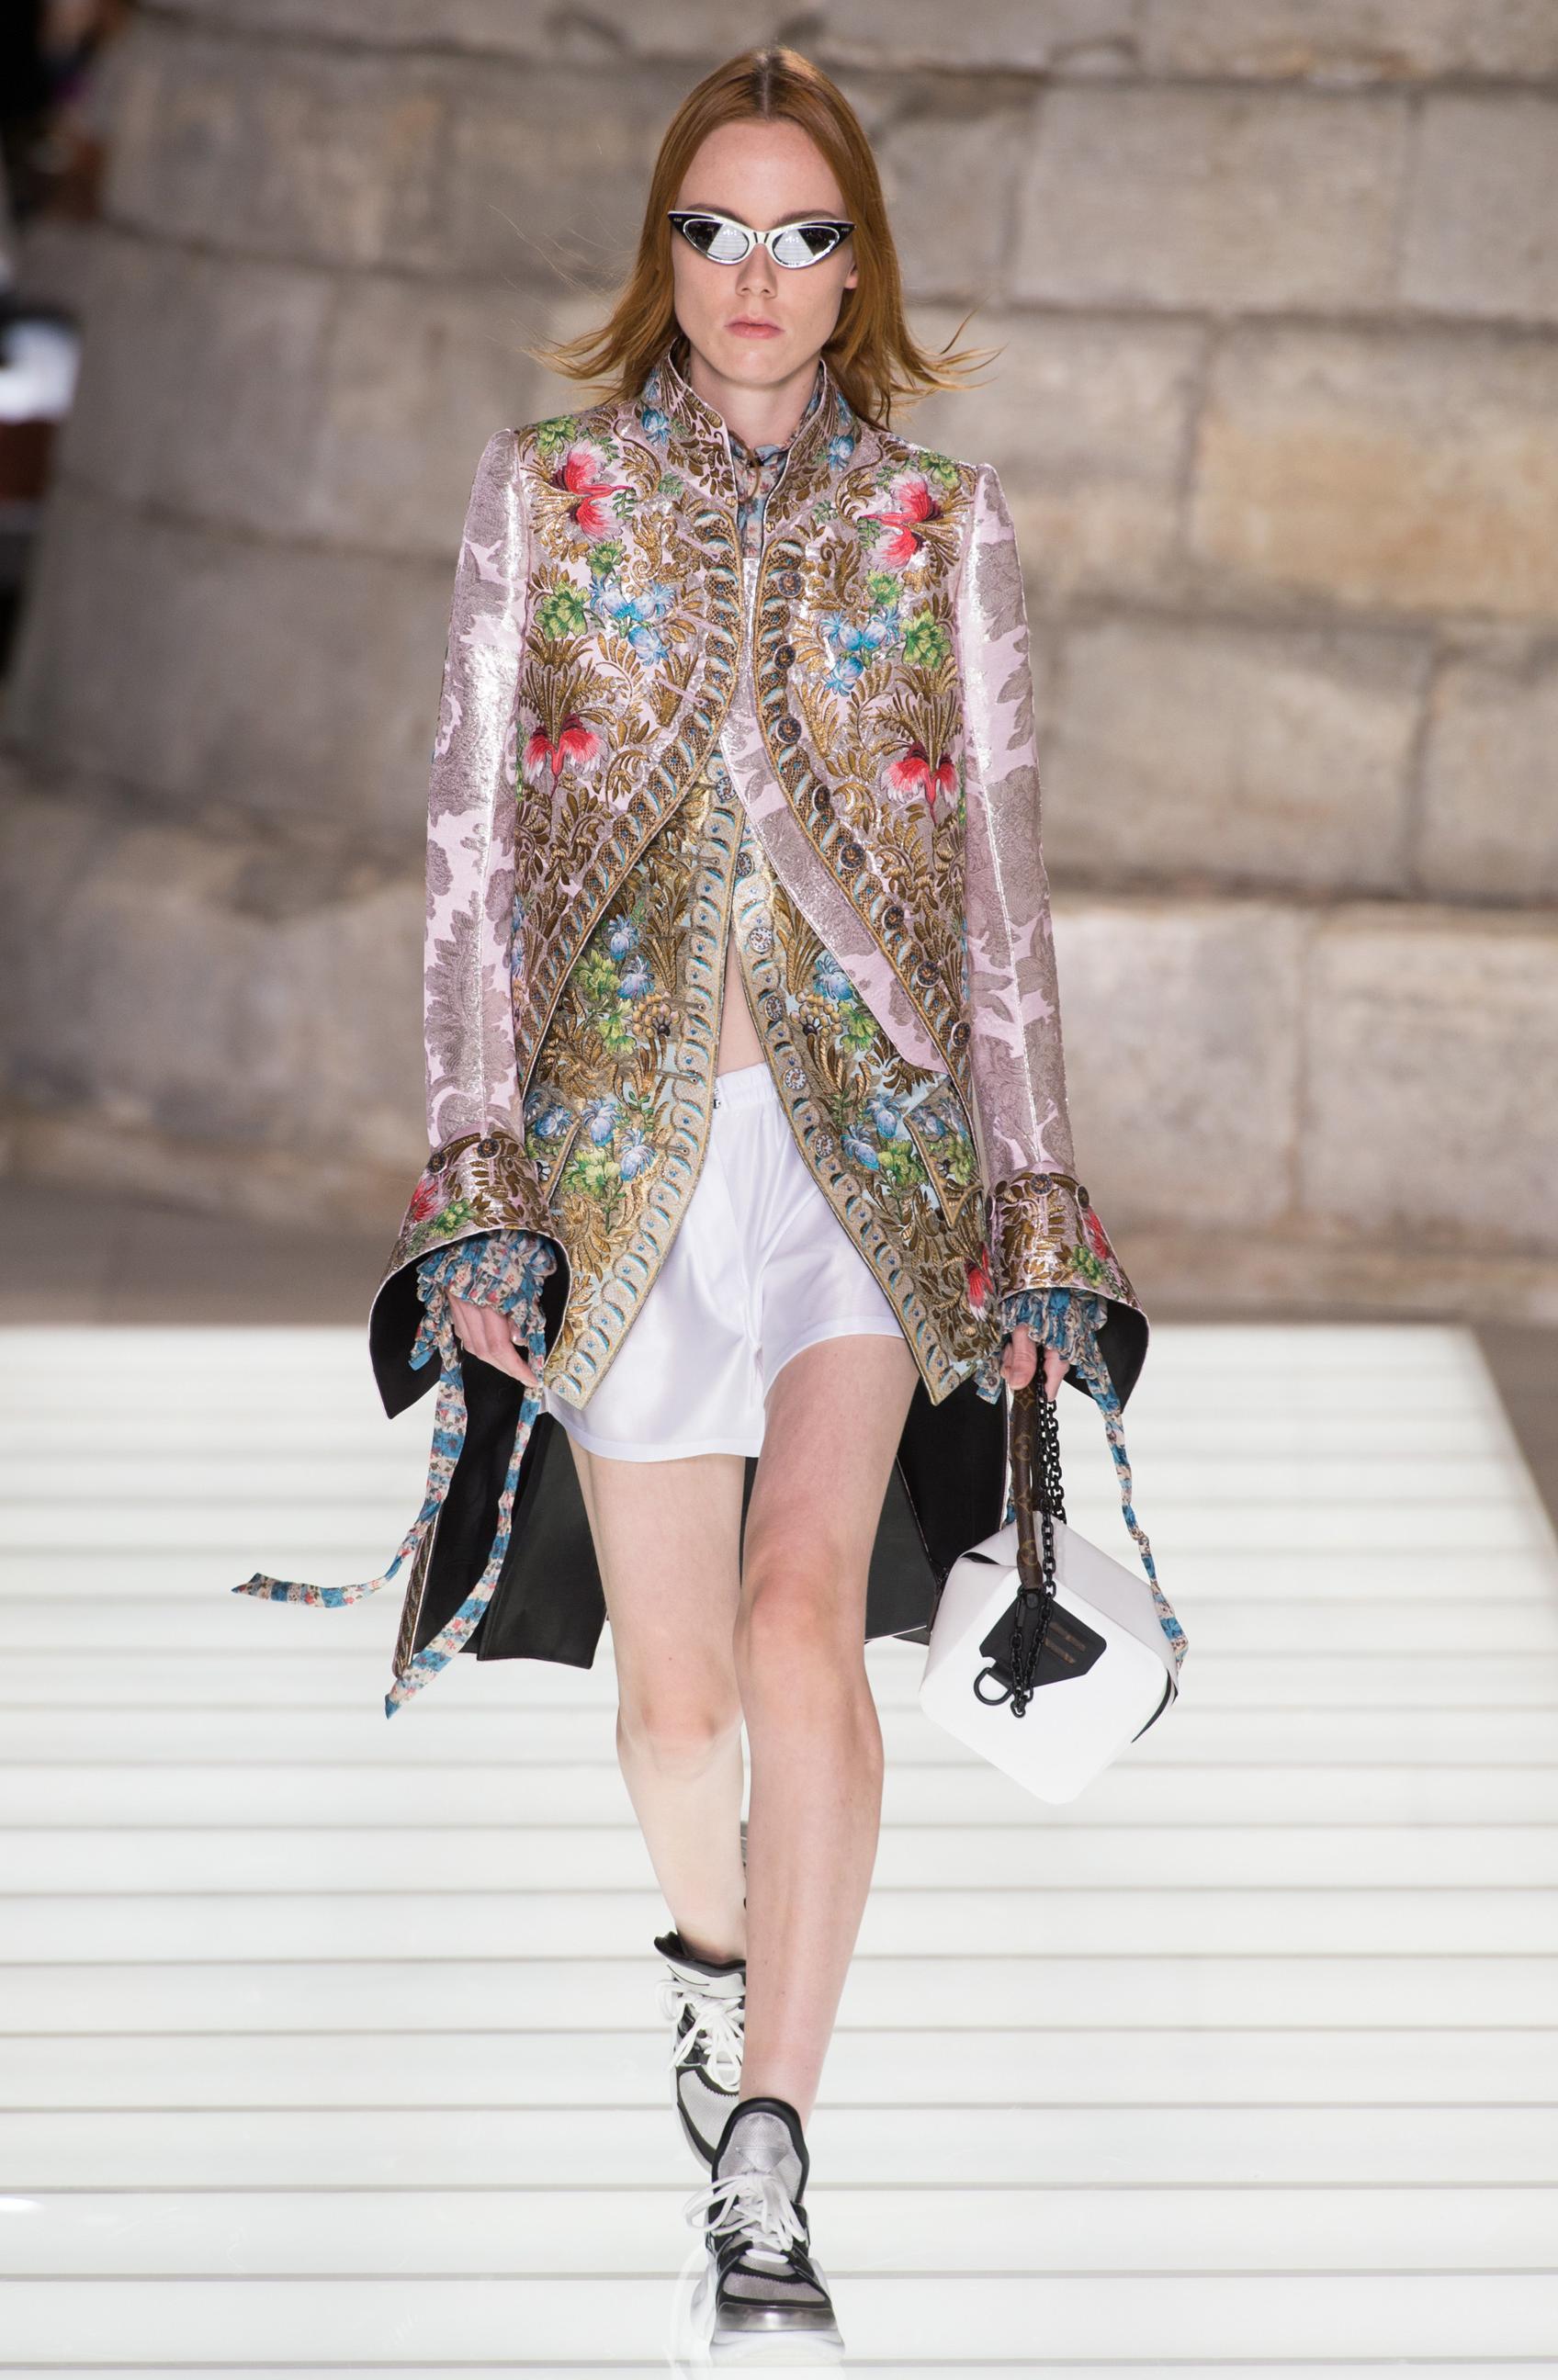 Louis Vuitton Spring-Summer 2018 Fab Styles